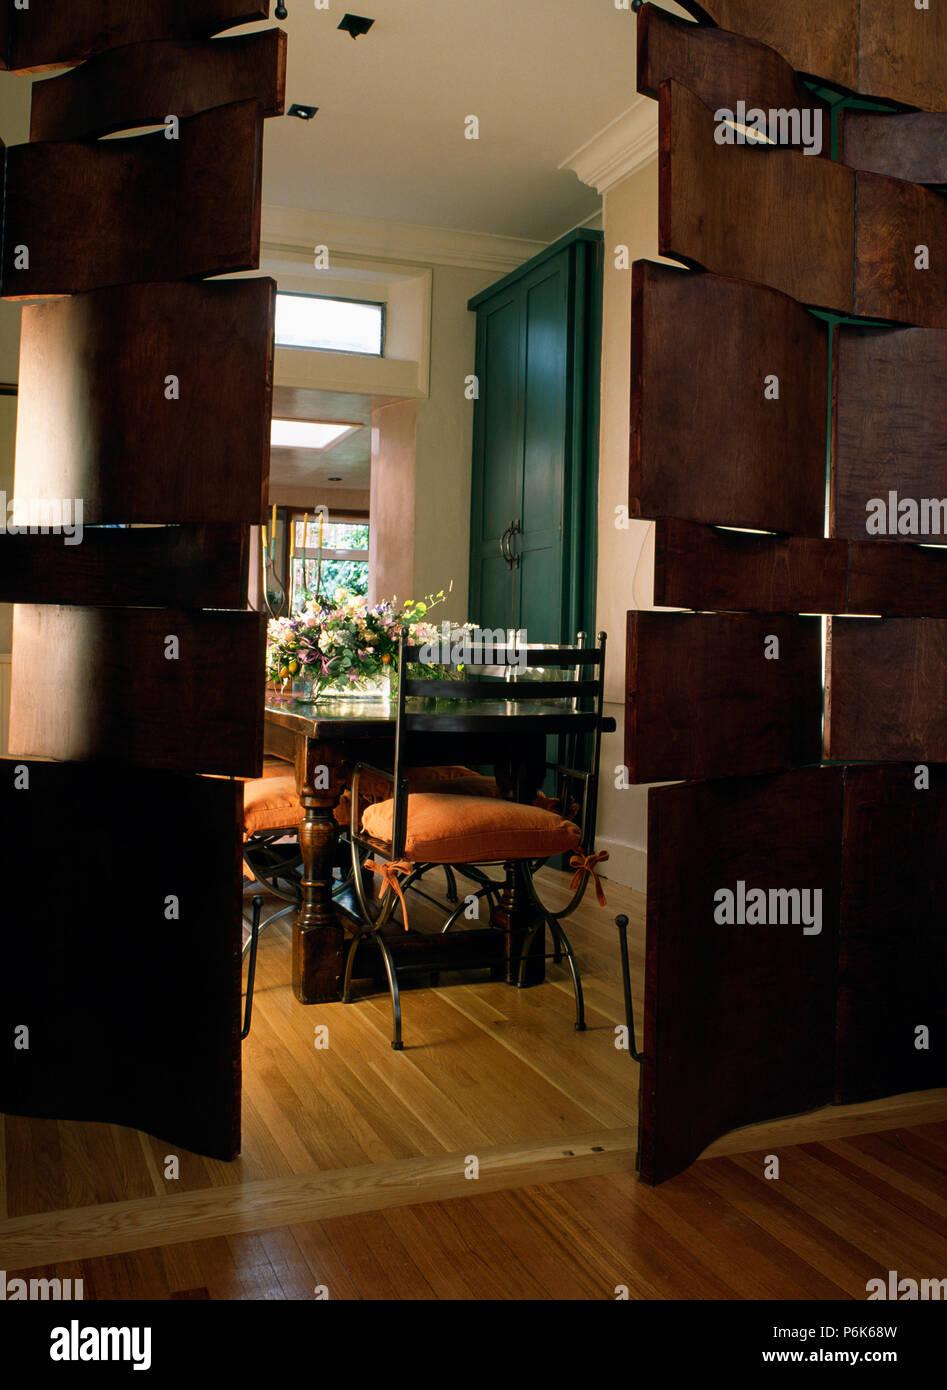 Puertas seccionadas modernos de madera para comedor moderno ...